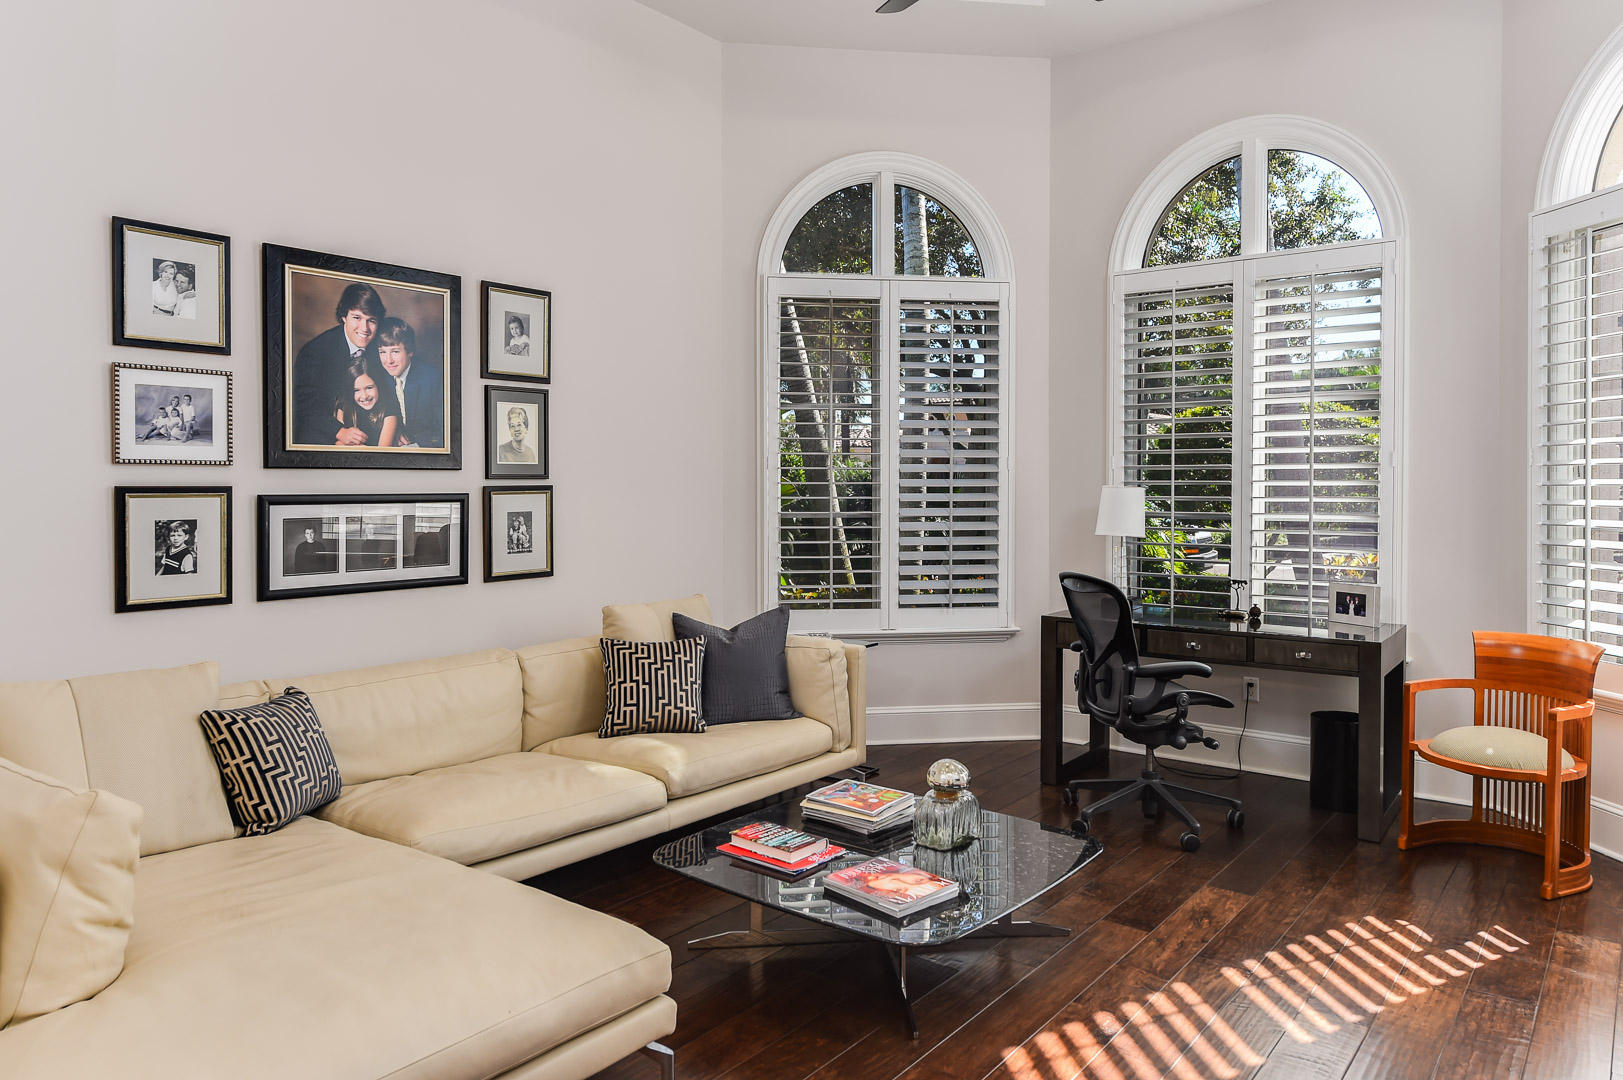 11755 Elina Court, Palm Beach Gardens, Florida 33418, 4 Bedrooms Bedrooms, ,4.1 BathroomsBathrooms,A,Single family,Elina,RX-10487303